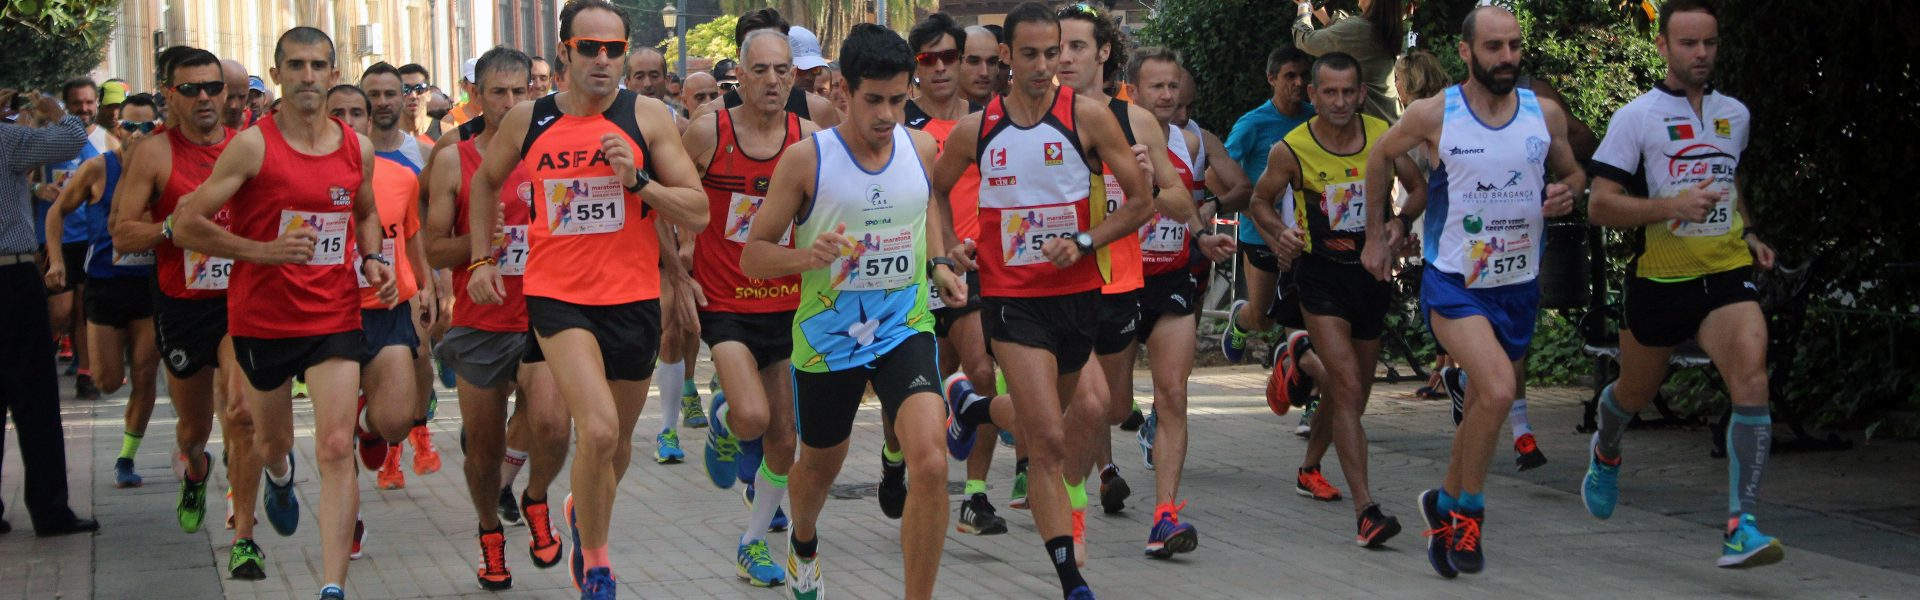 Partida Meia Maratona